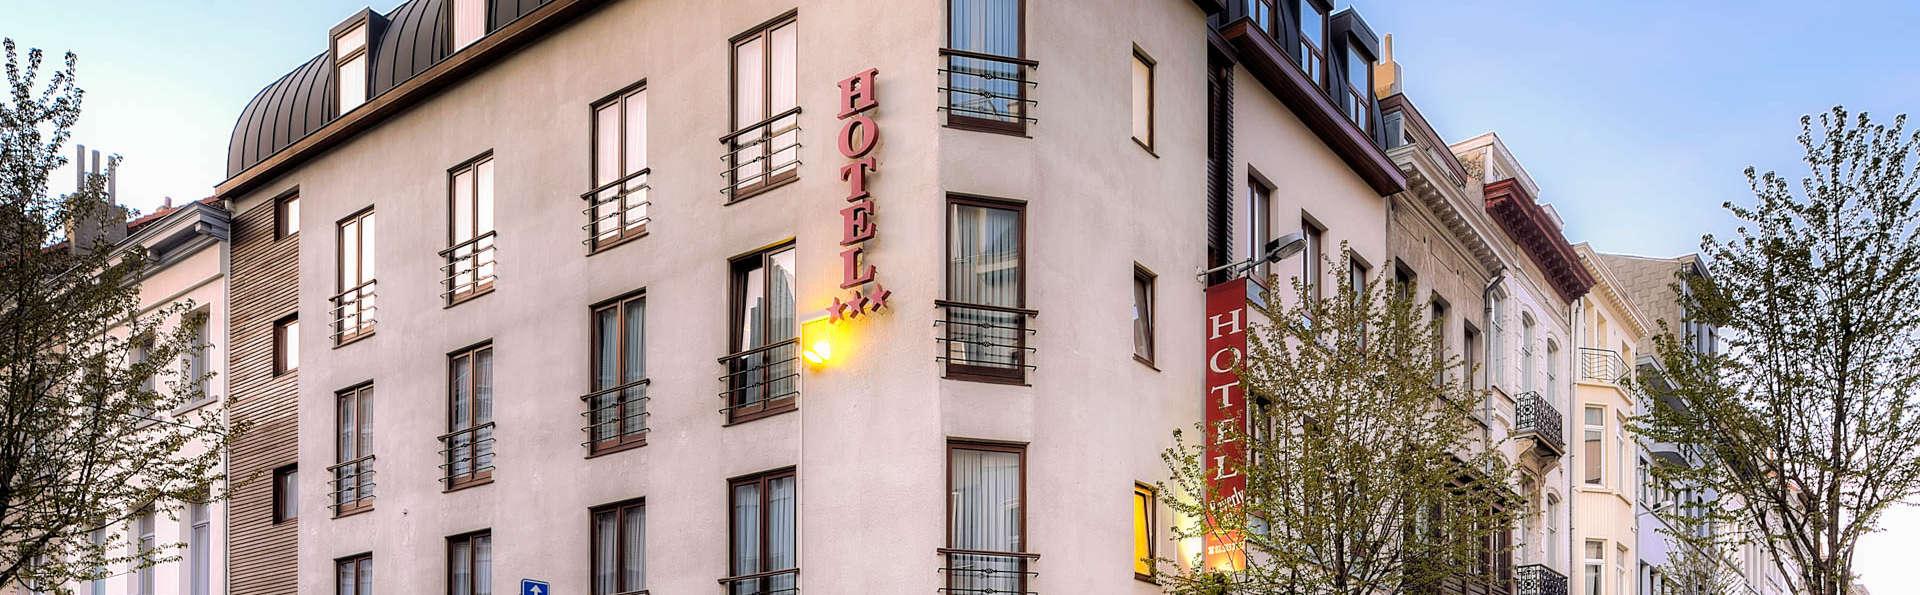 Beverly Hills Hotel - EDIT_FRONT2.jpg